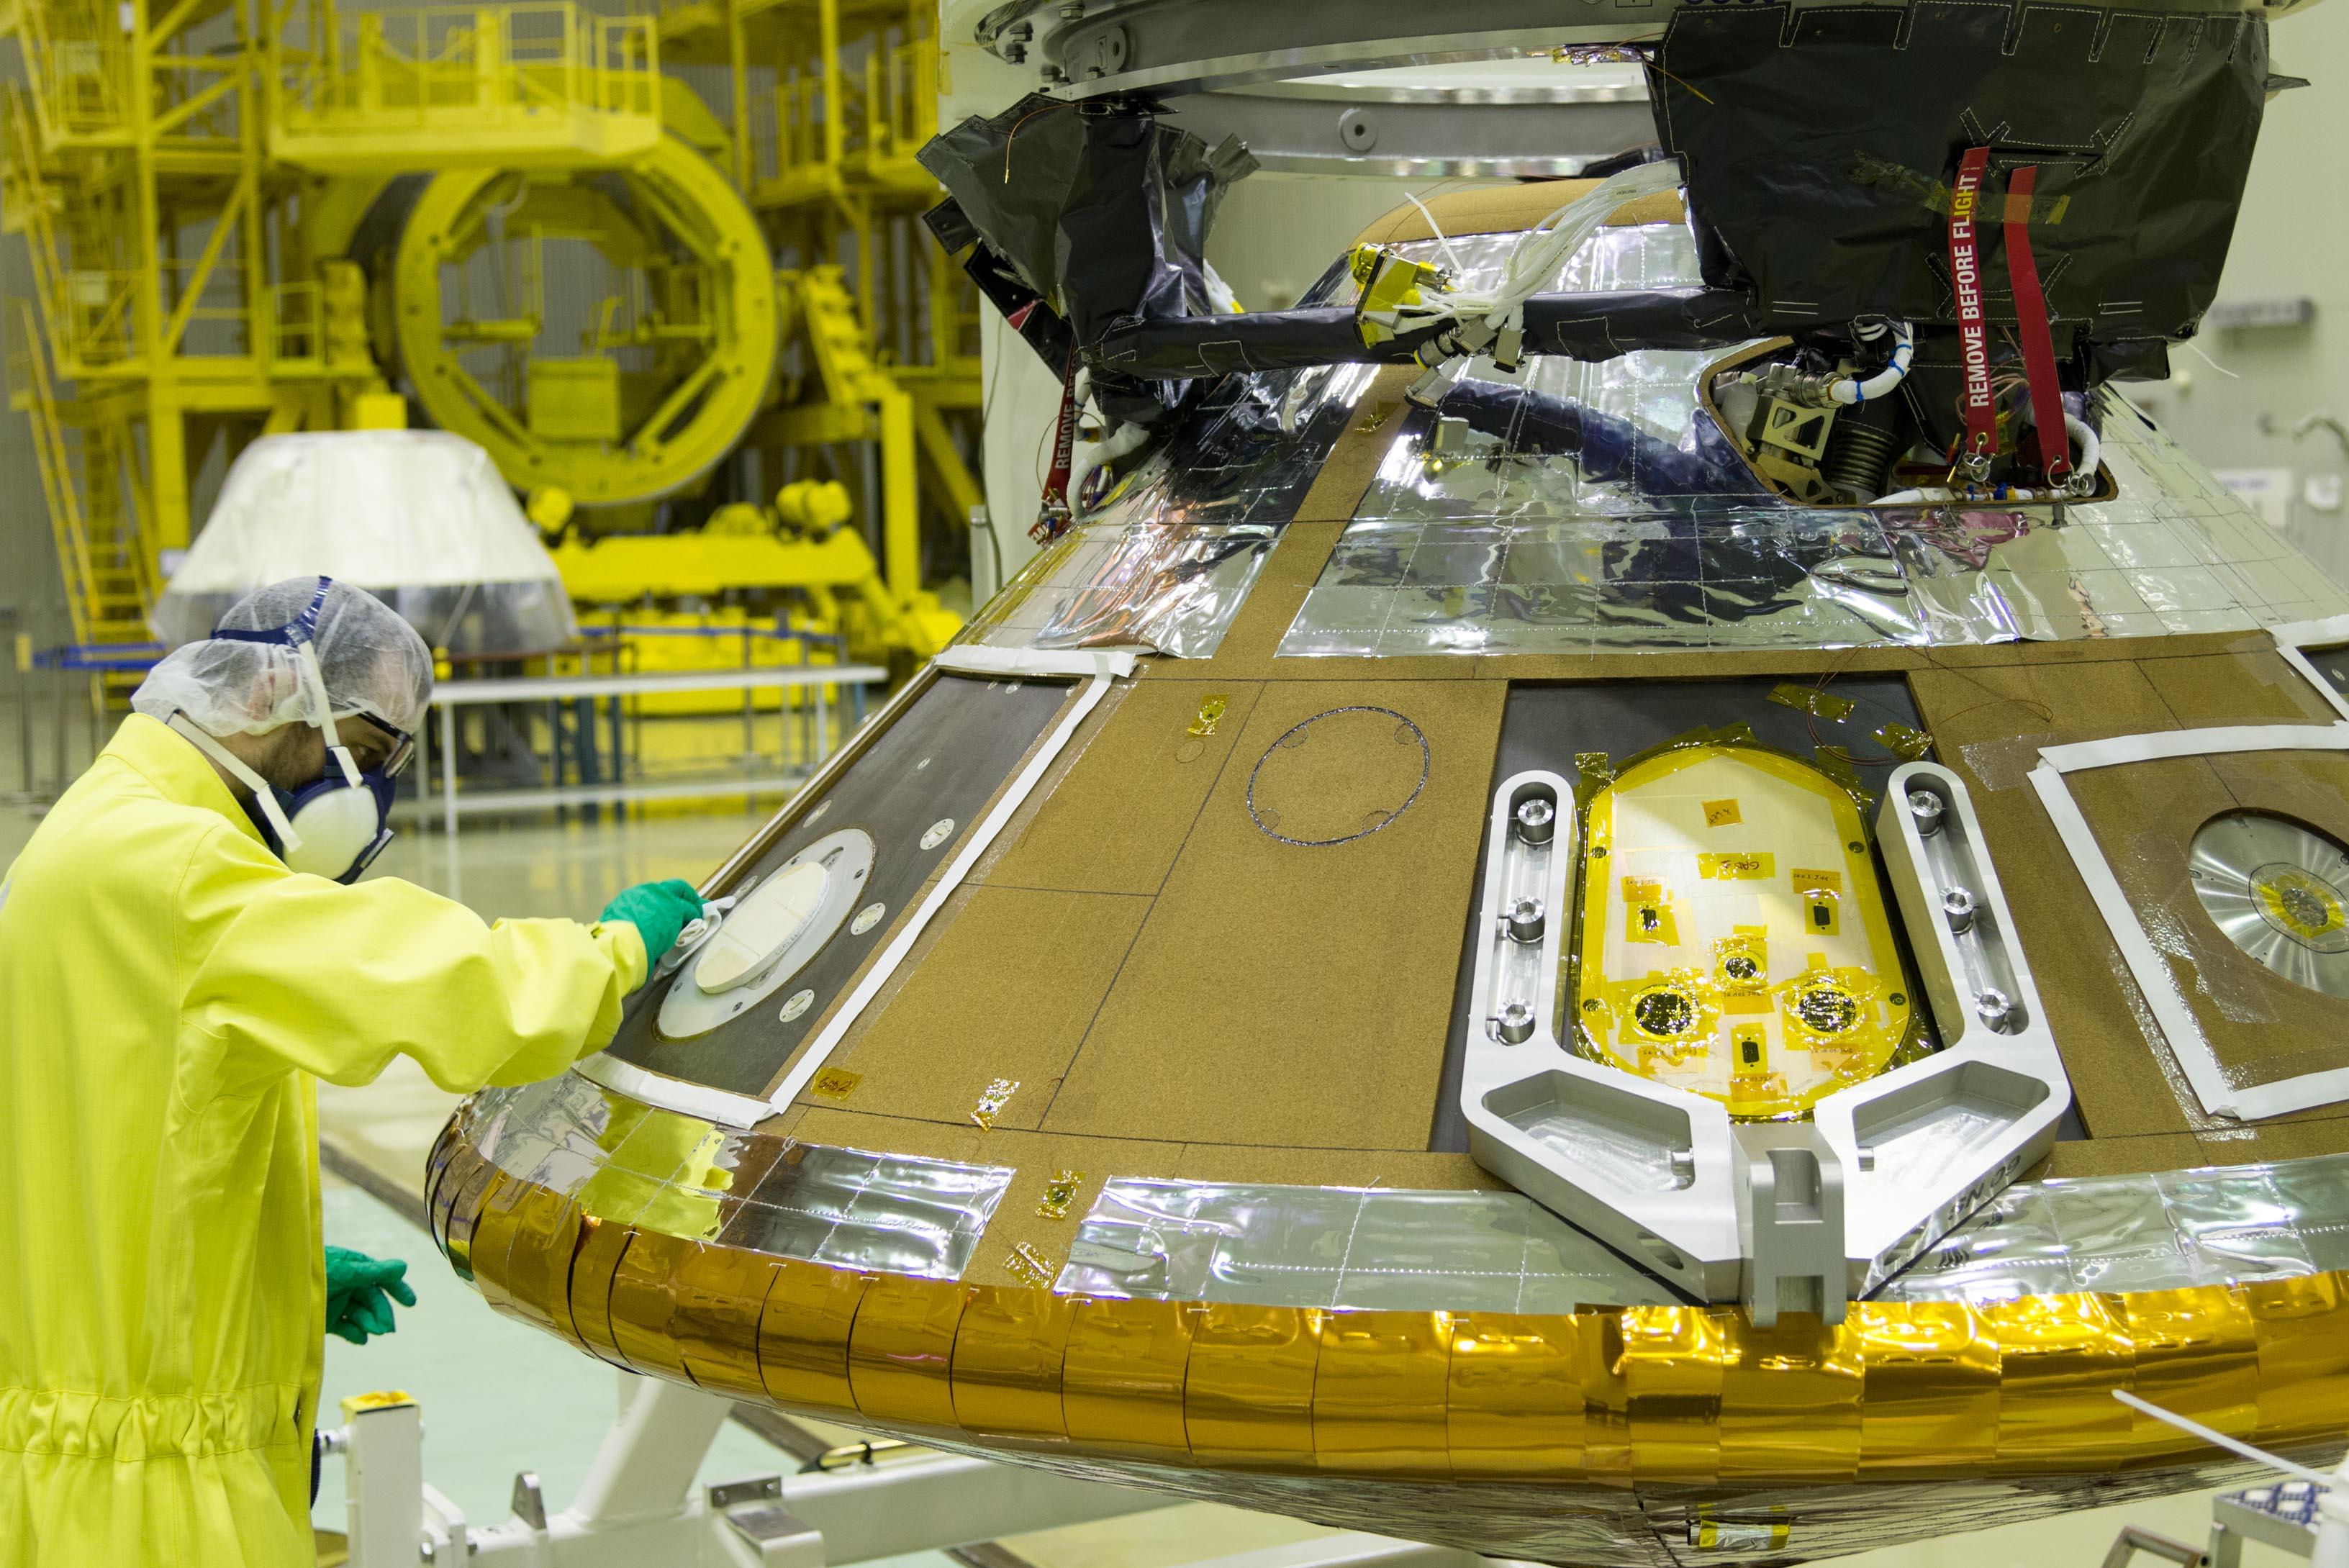 ExoMars_160206-LC-AIT-17pe.jpg